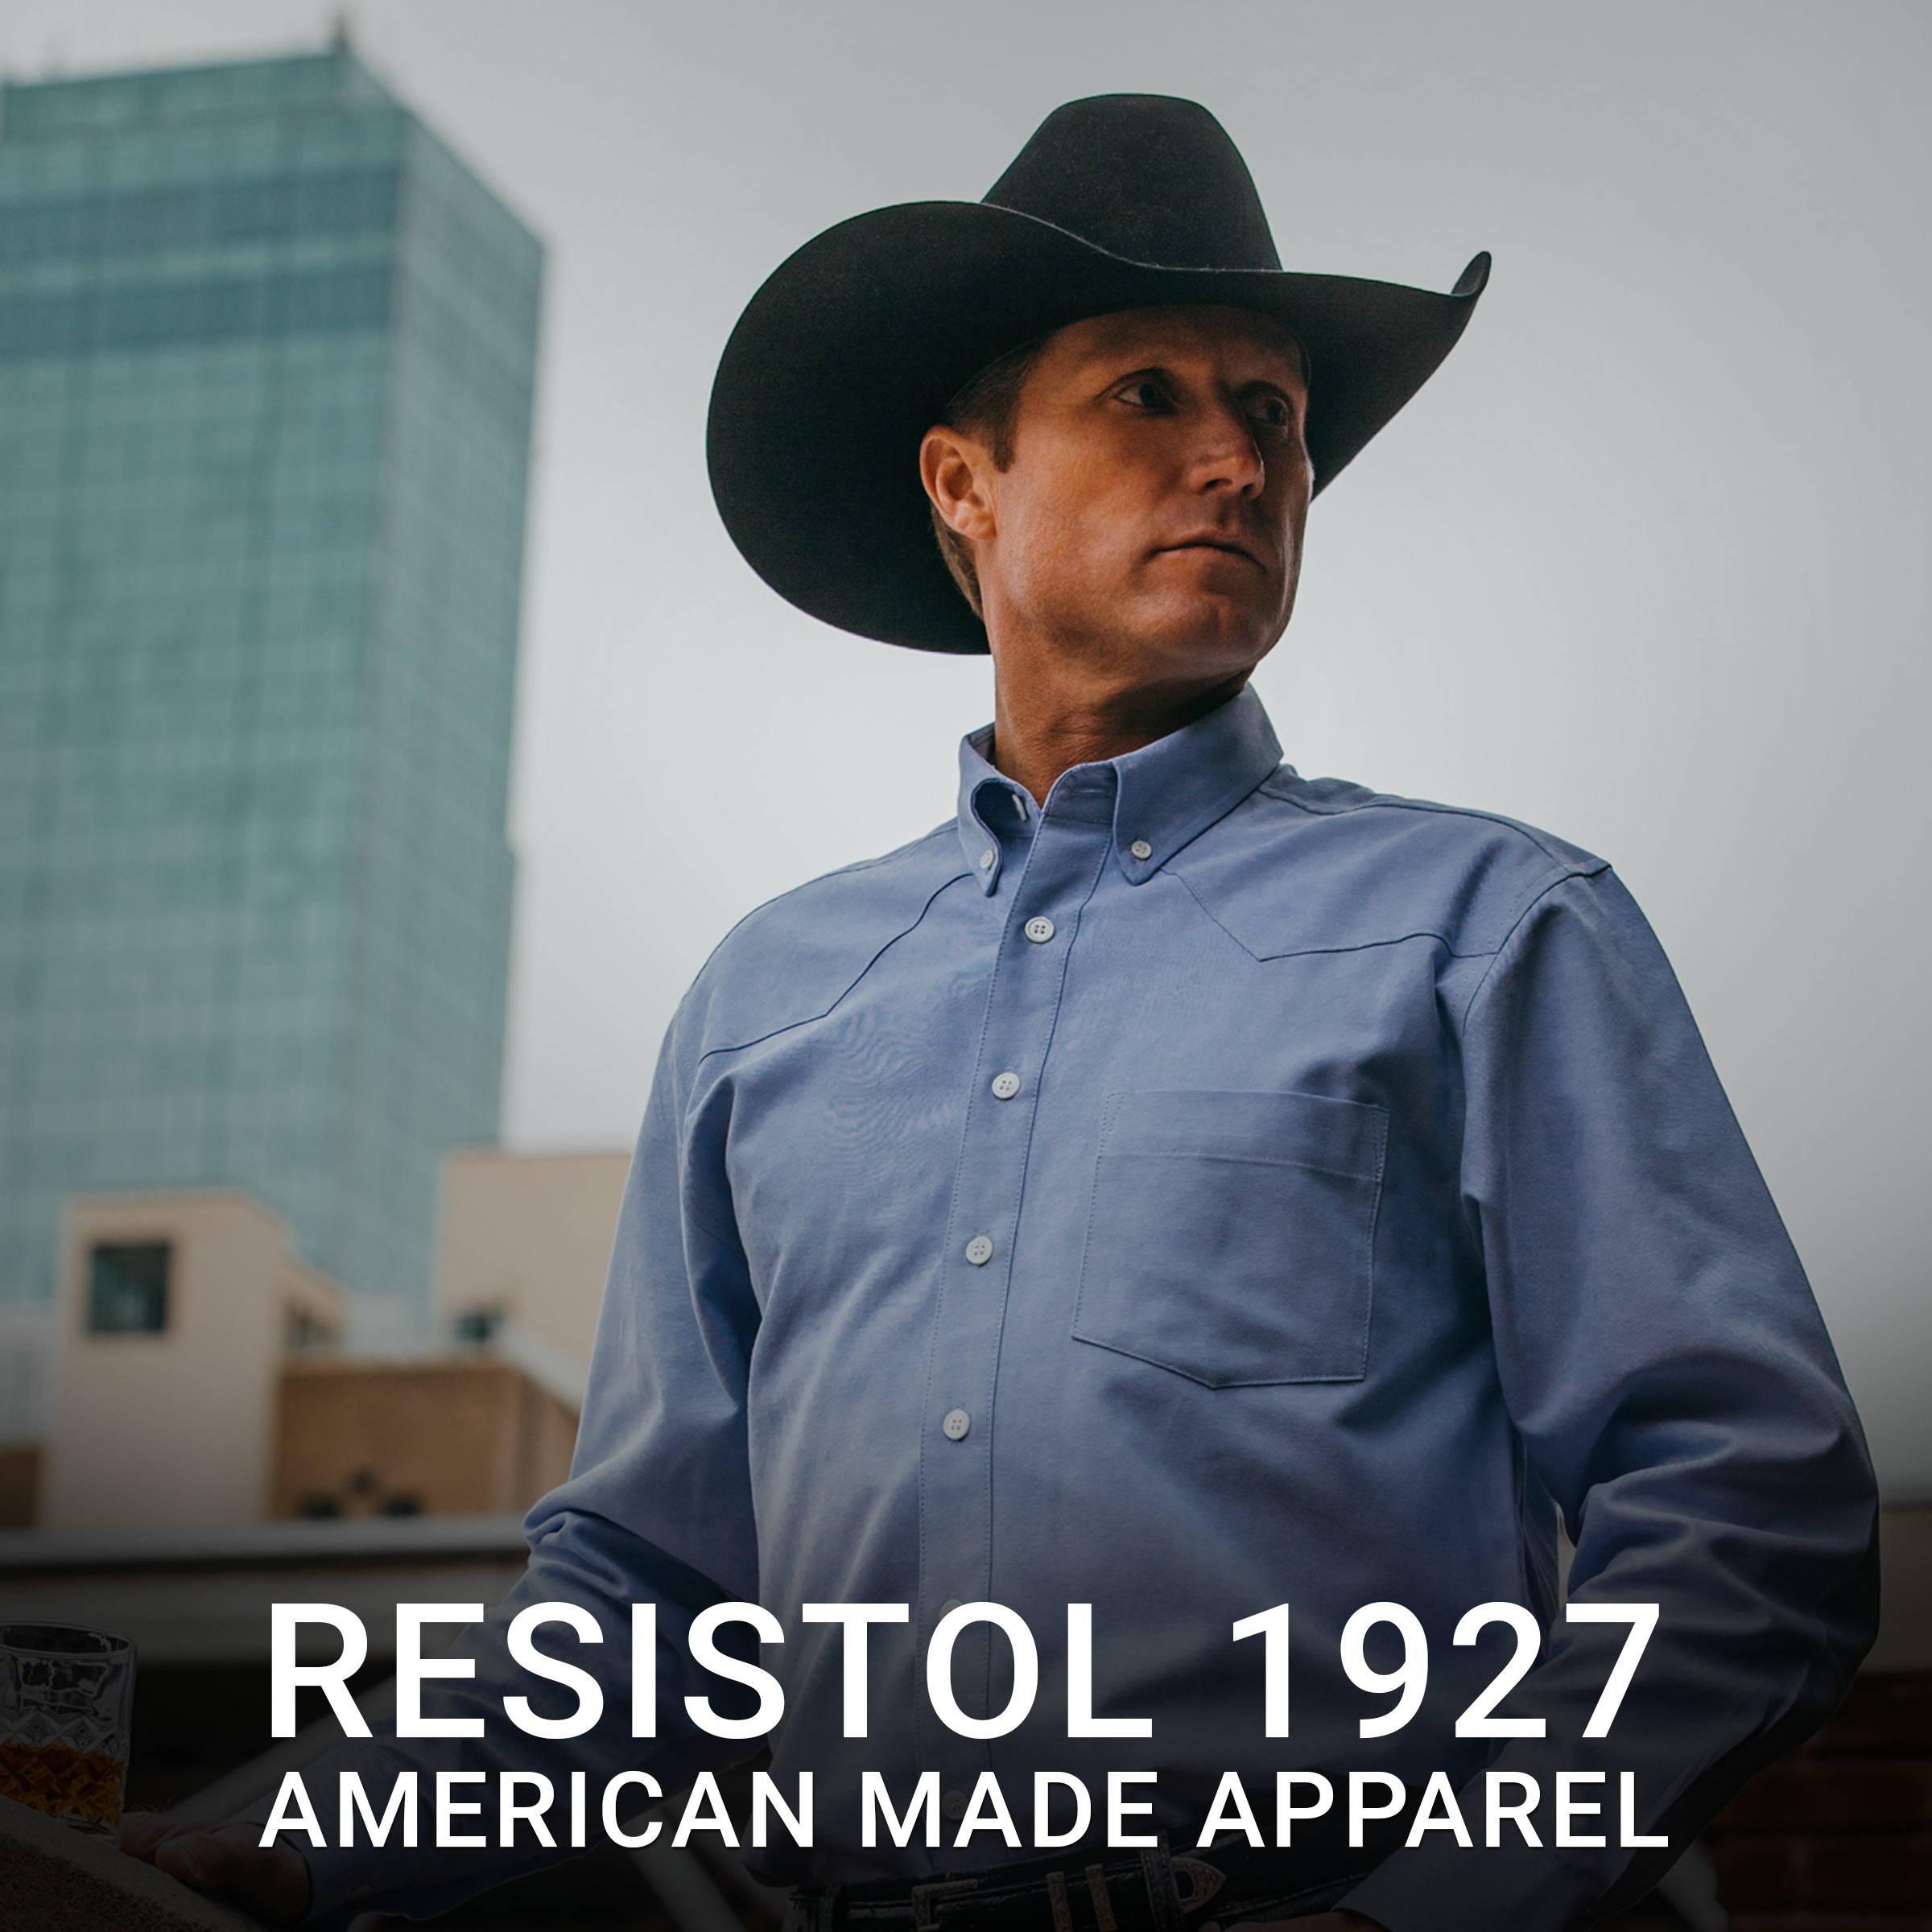 Resistol 1927 - American Made Apparel